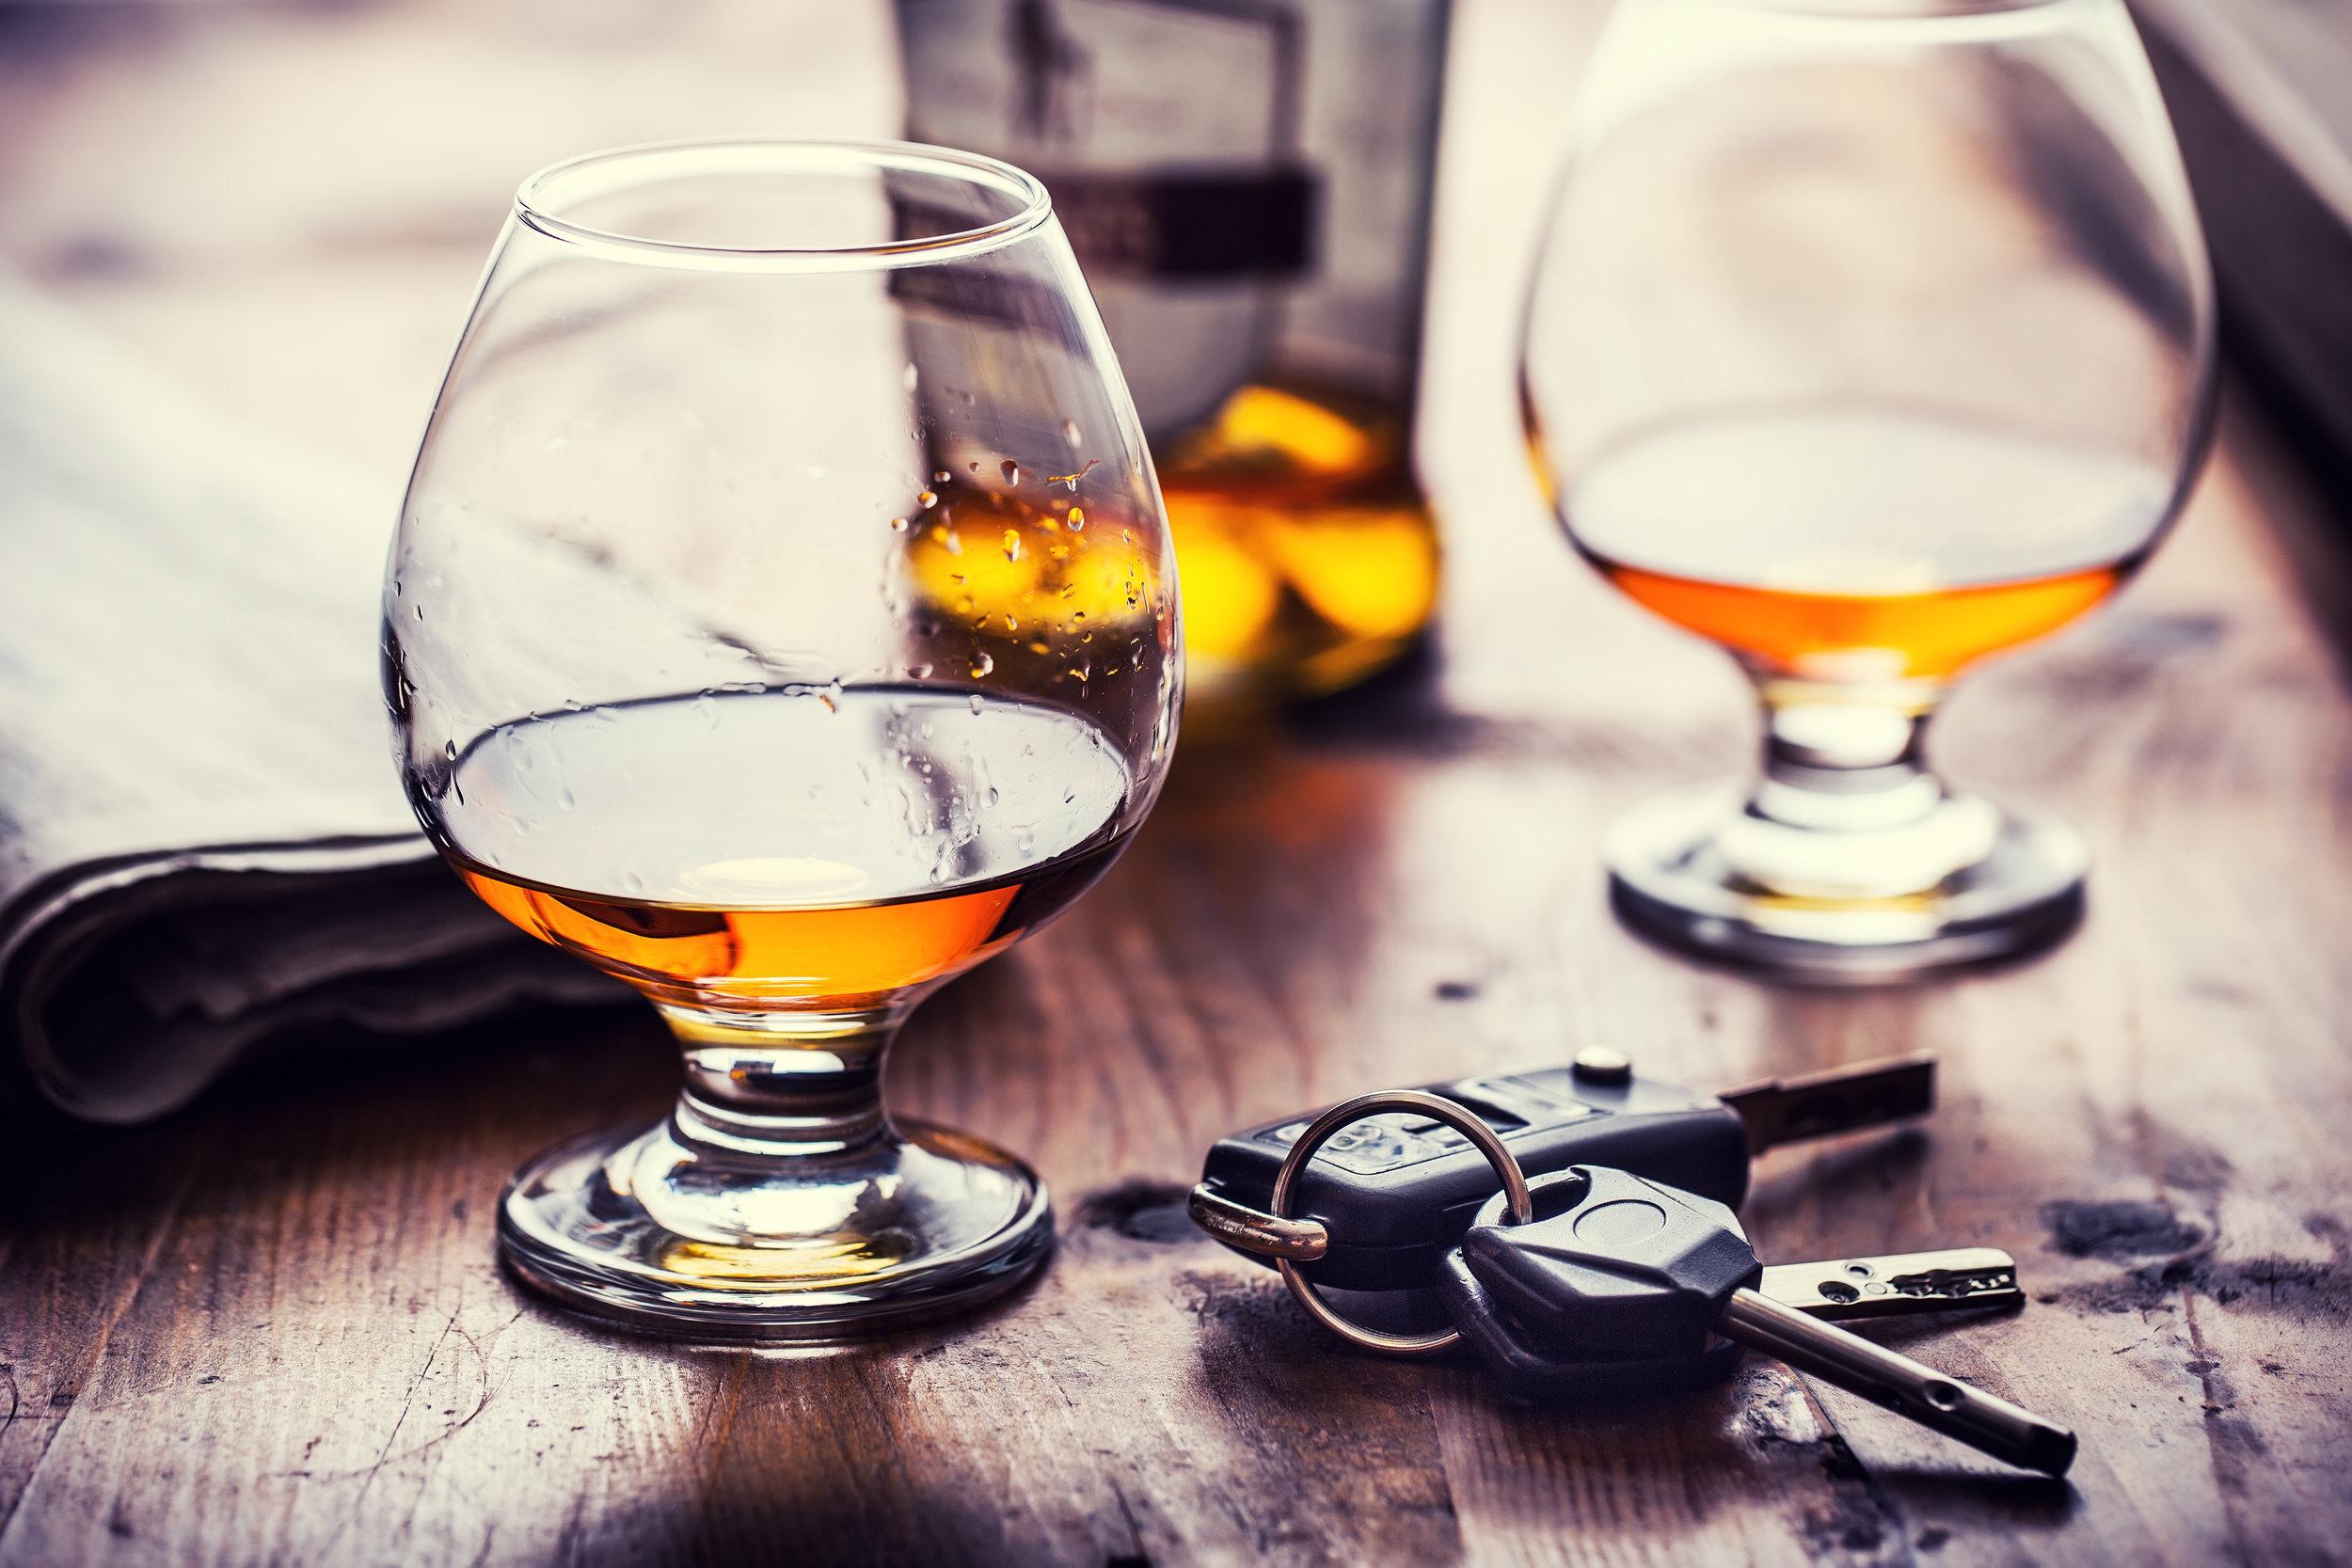 Criminal Defense, Traffic,Municipal Violations - Defensa Criminal,Conducir